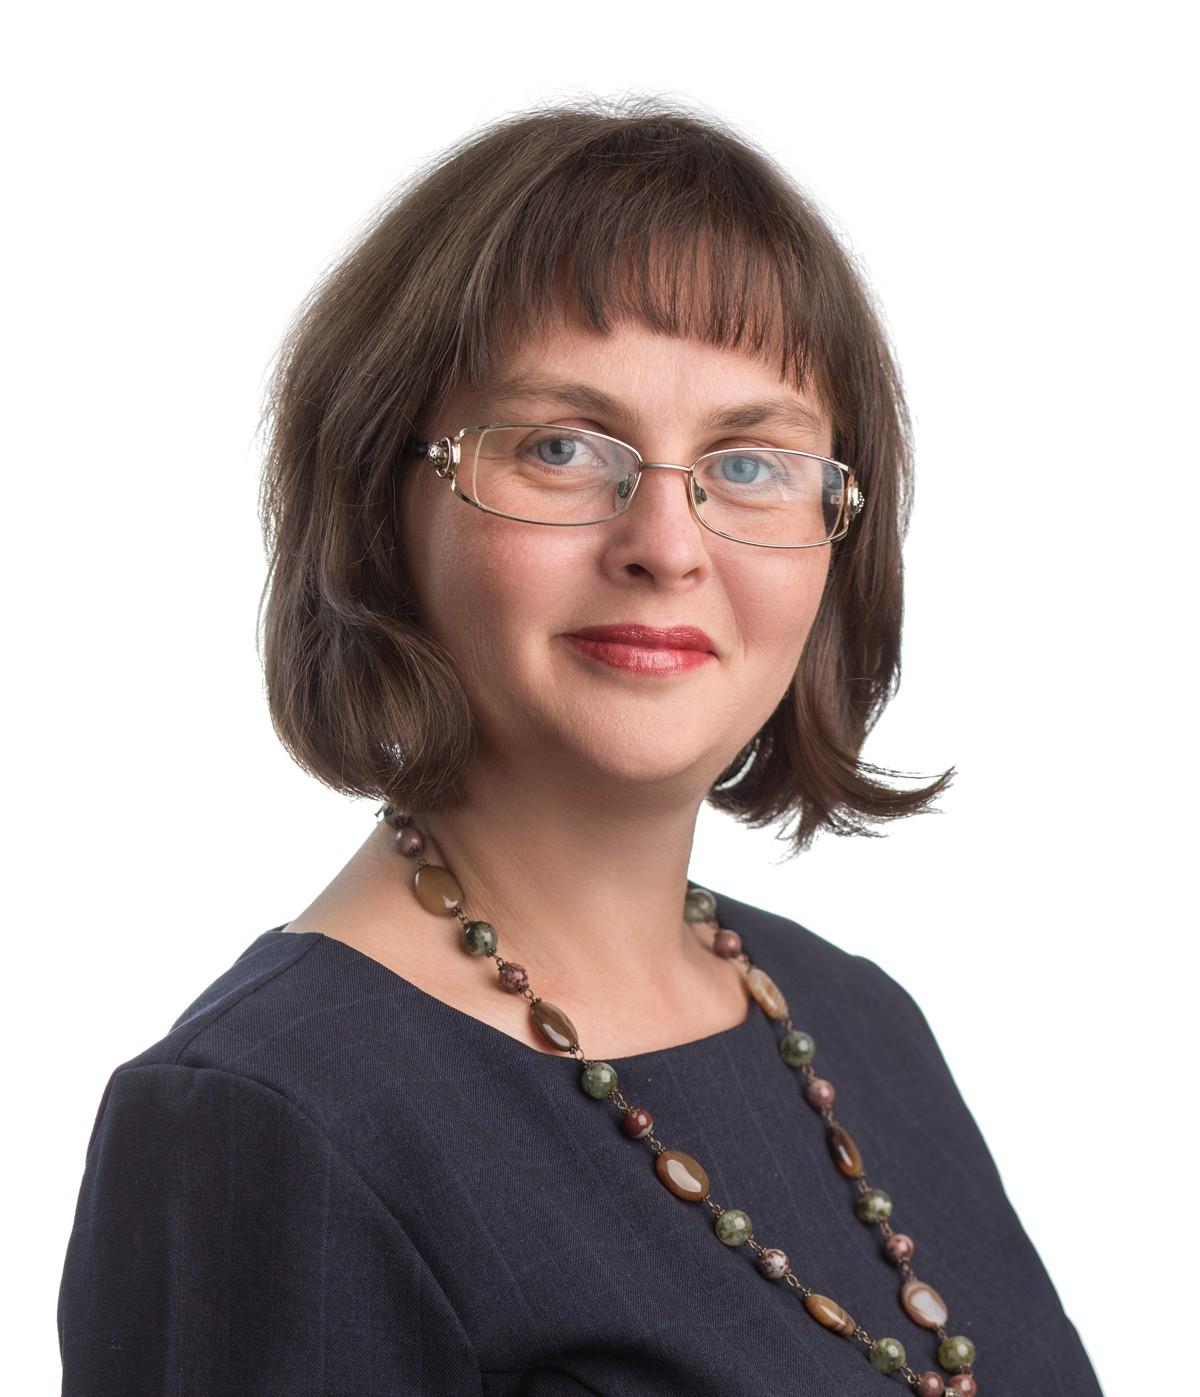 Klepatskaya